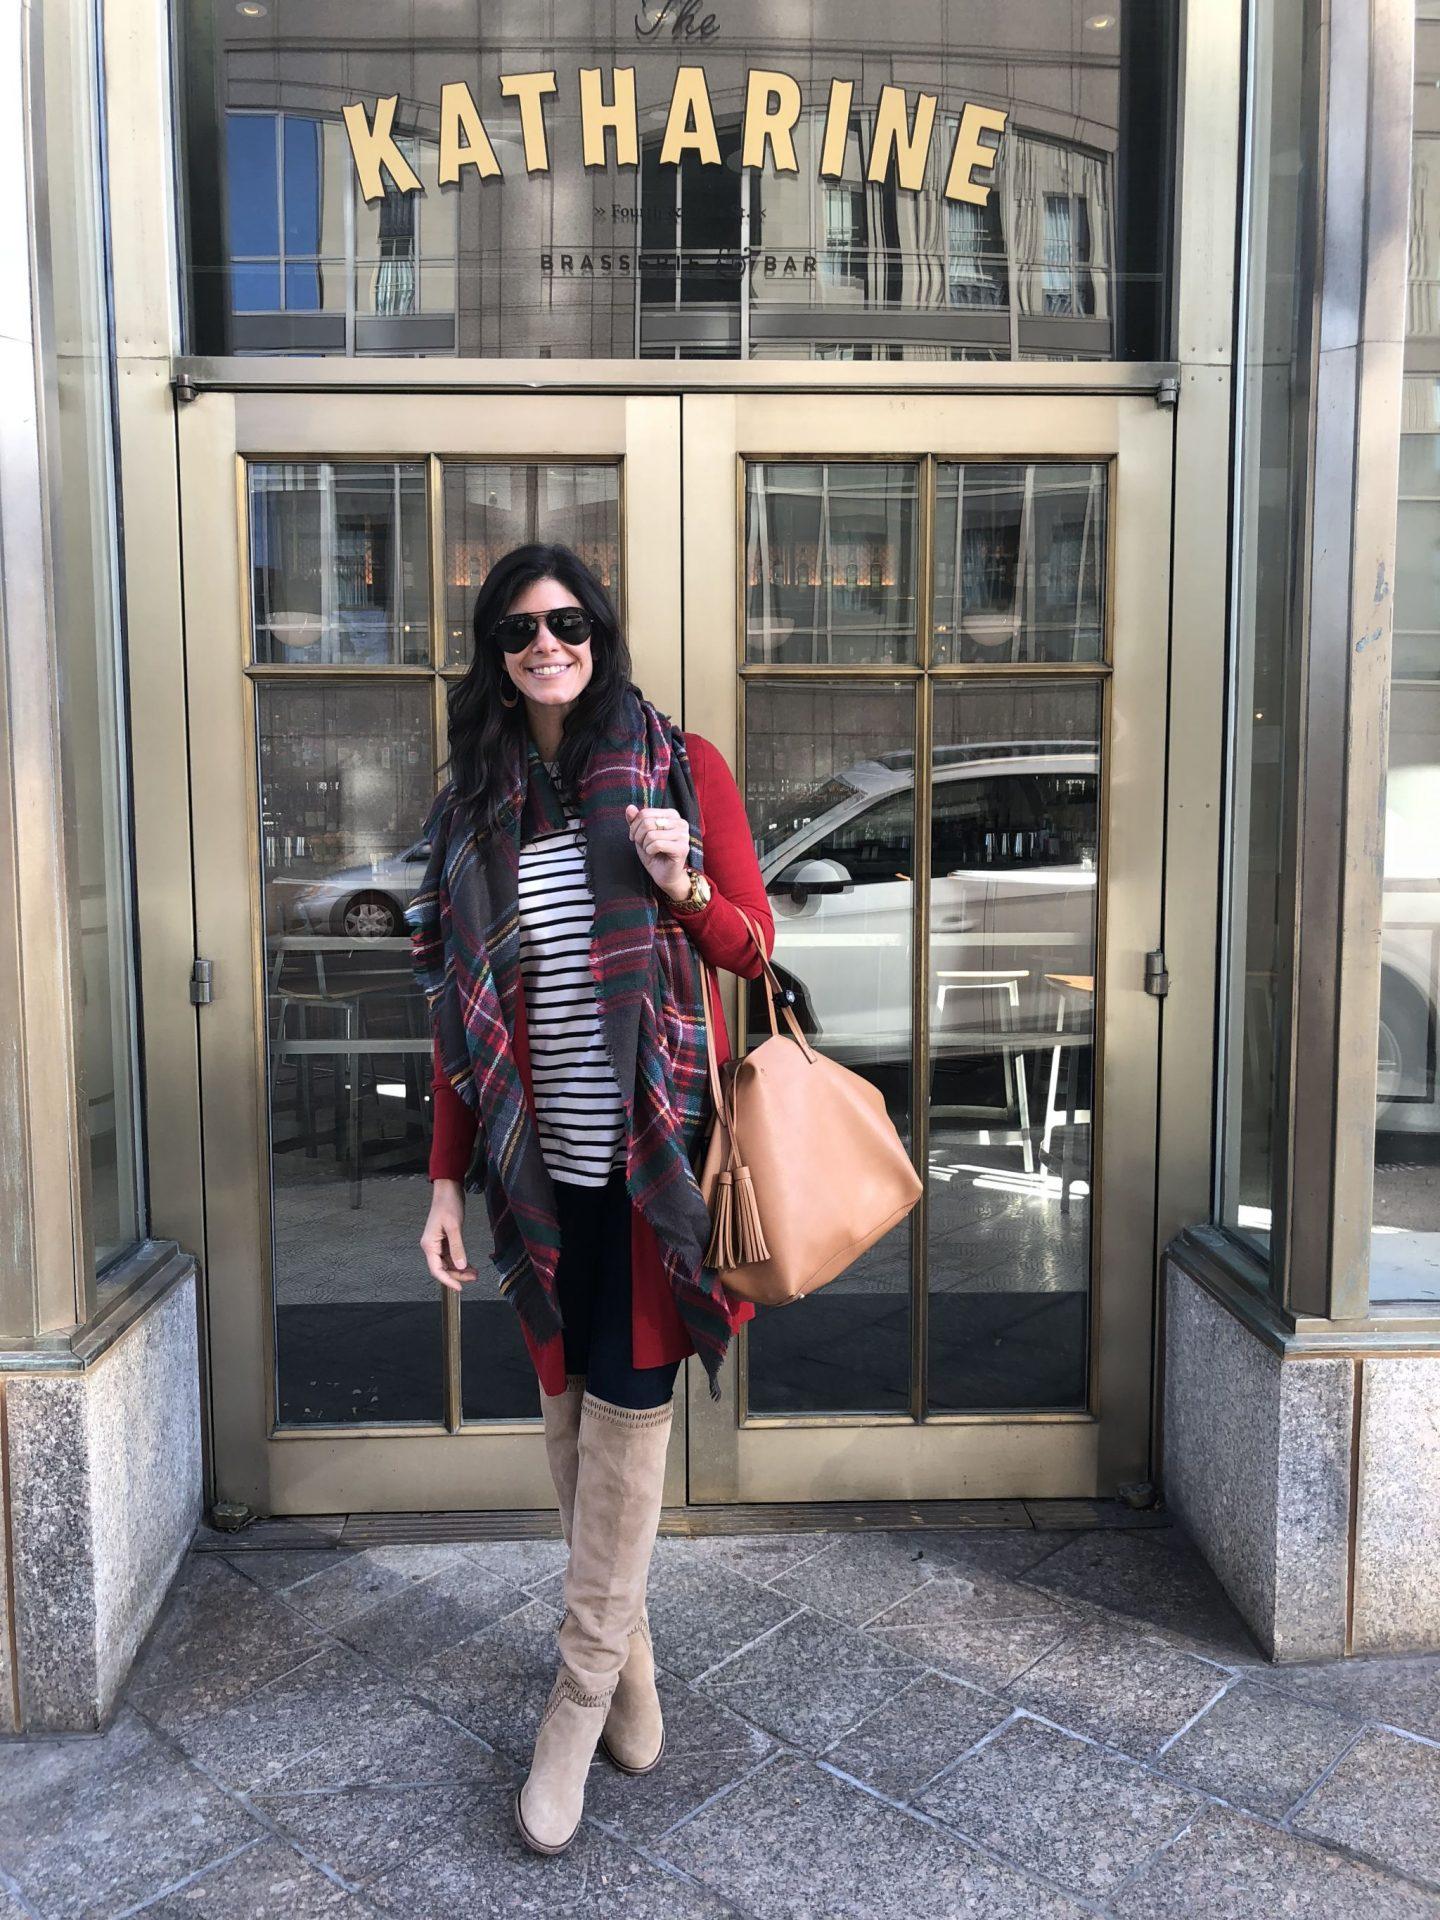 Kimpton Cardinal Hotel - Winston Salem - Lauren Schwaiger Travel Blog